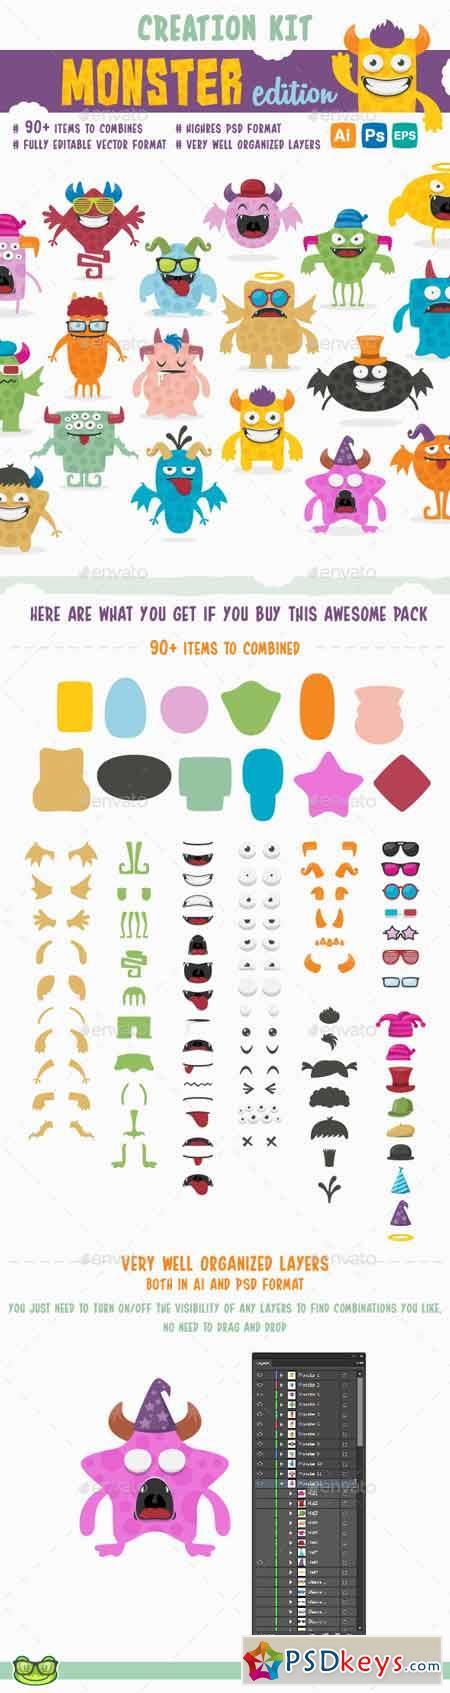 Creation Kit Monster Edition 9953610